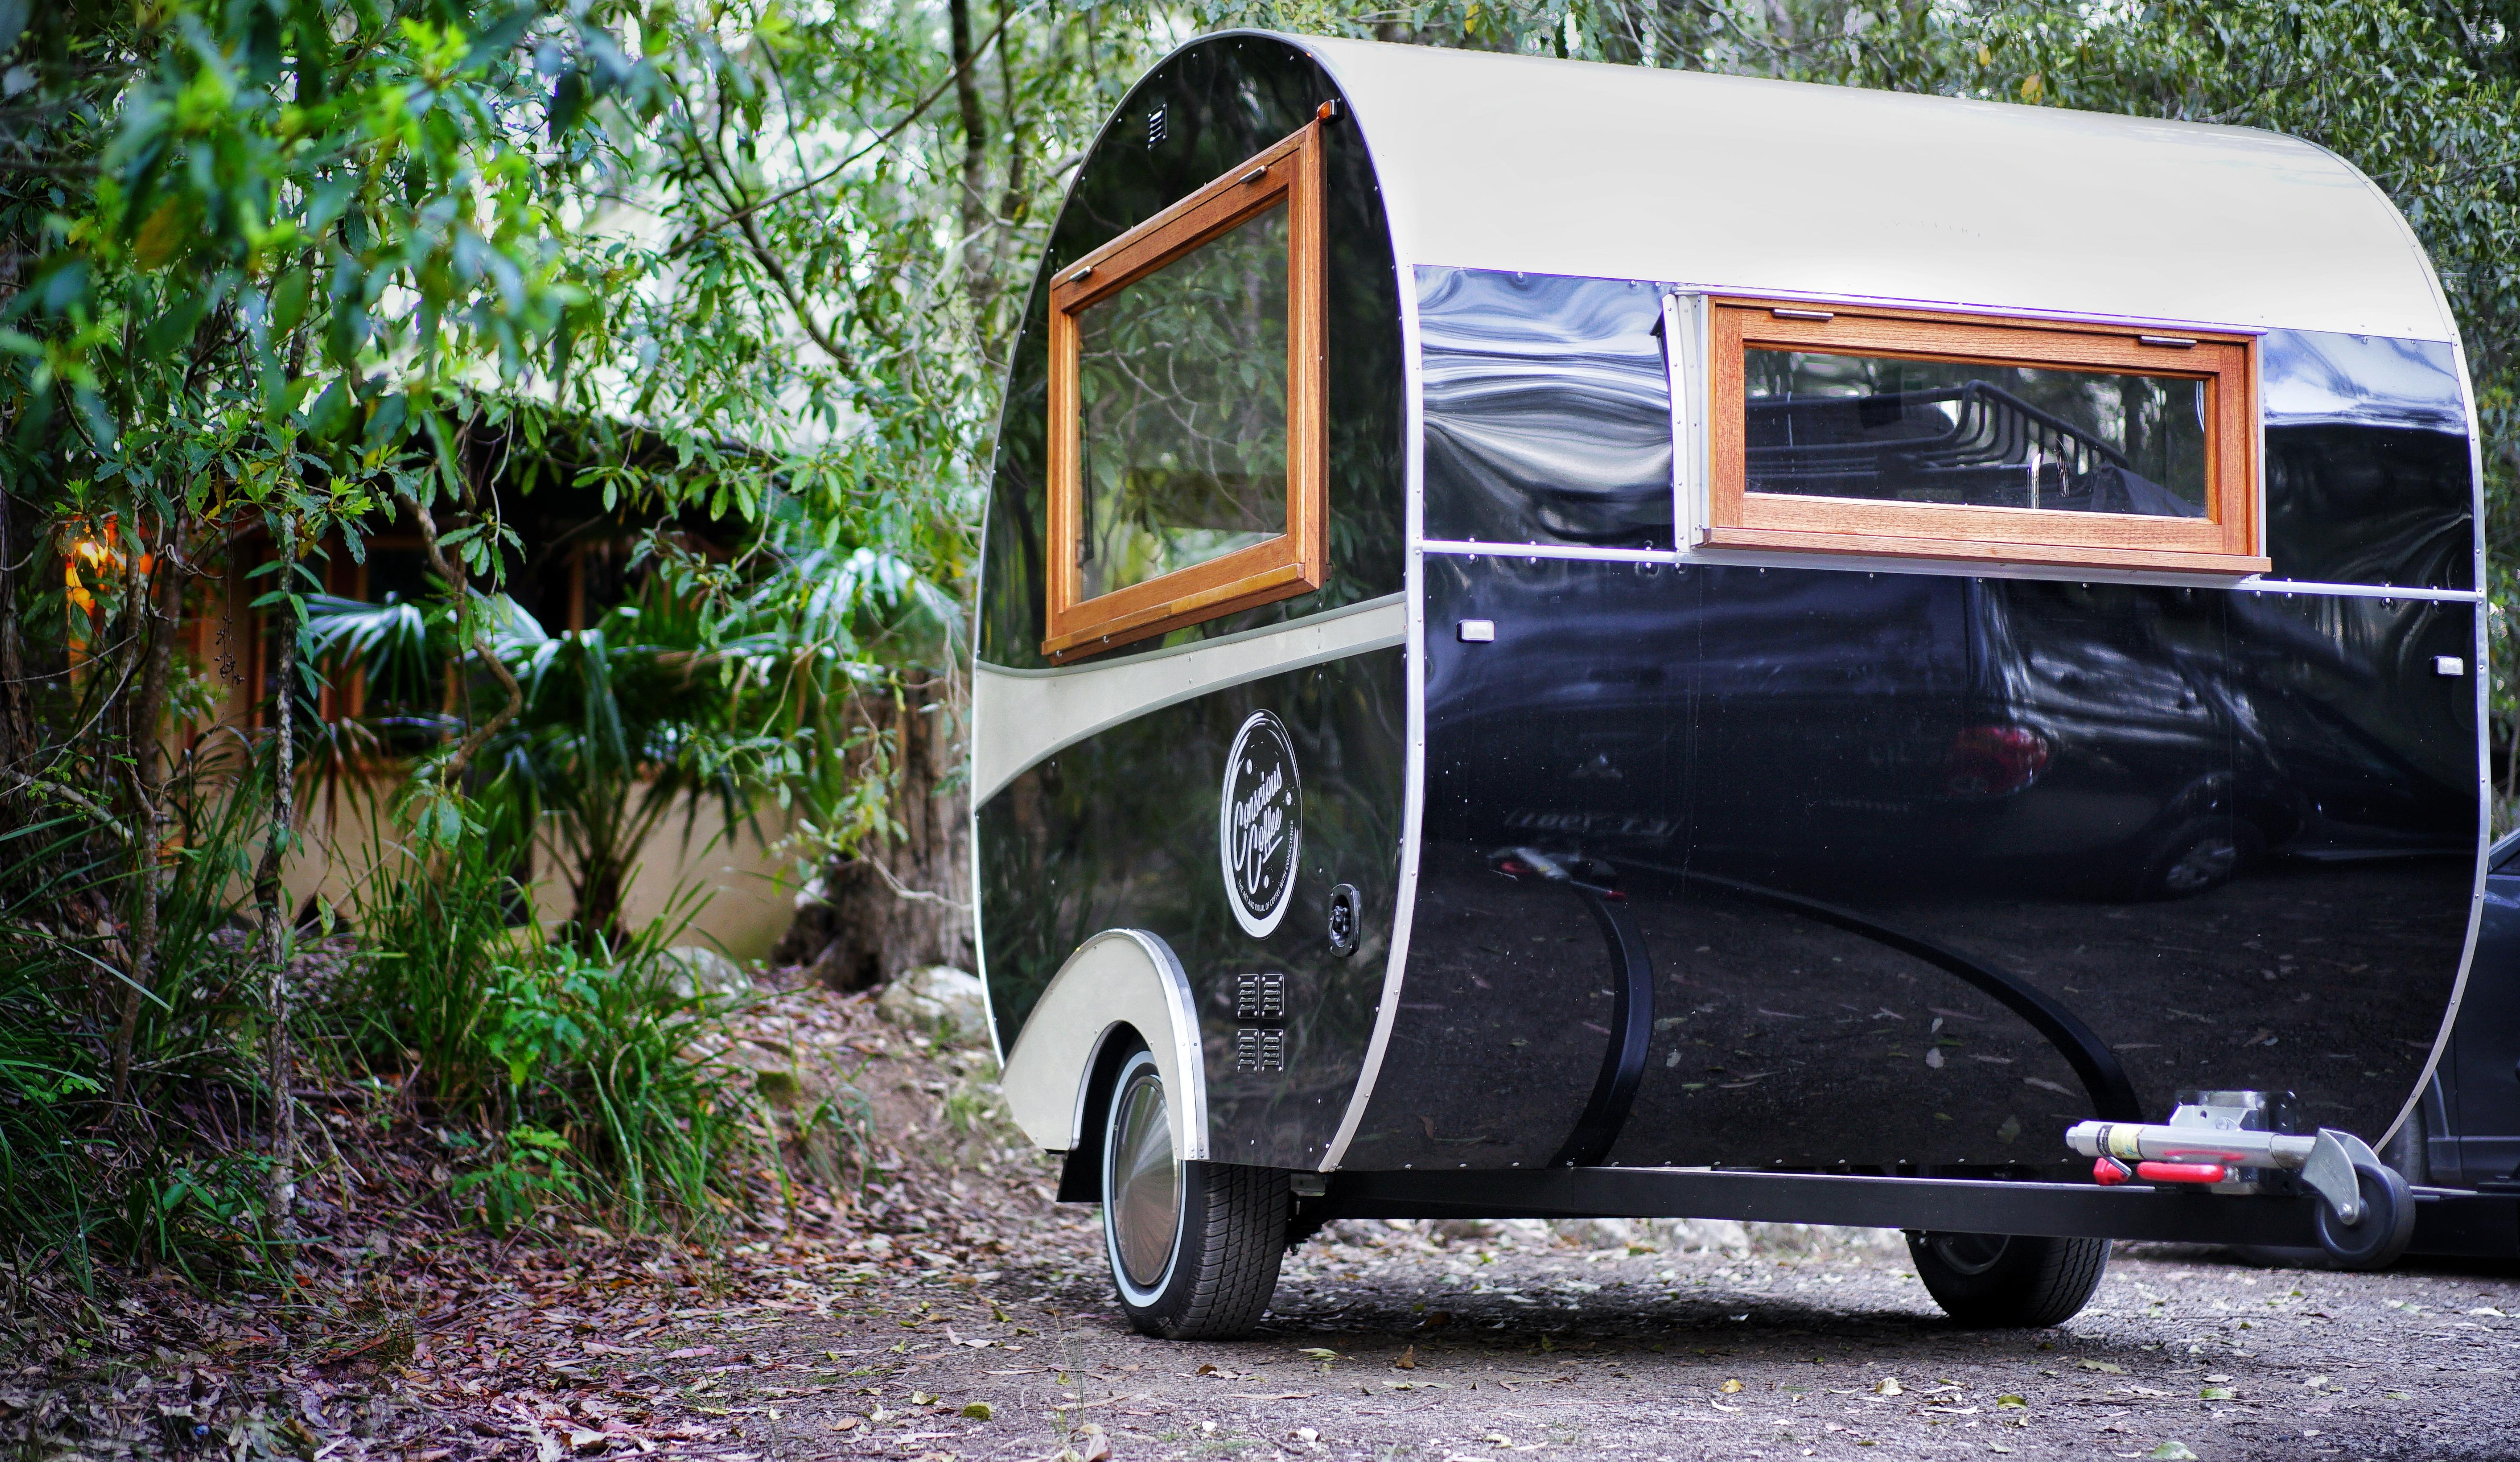 Hire Vintage Caravan - Minimum